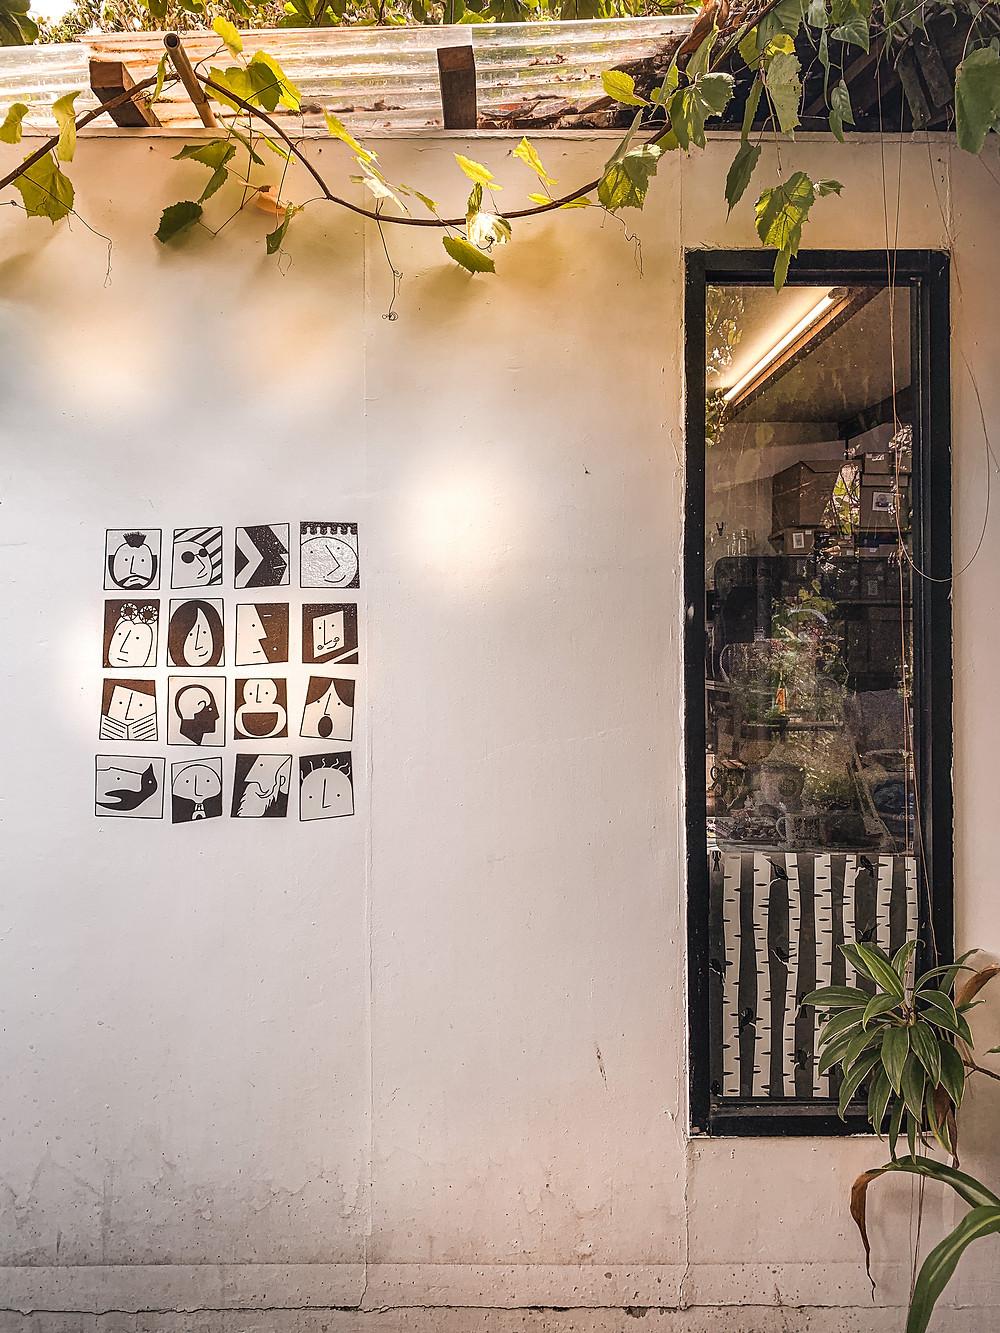 Doodle wall art and rectangular black window facade of KIWE, Penang, RollingBear Travels blog.